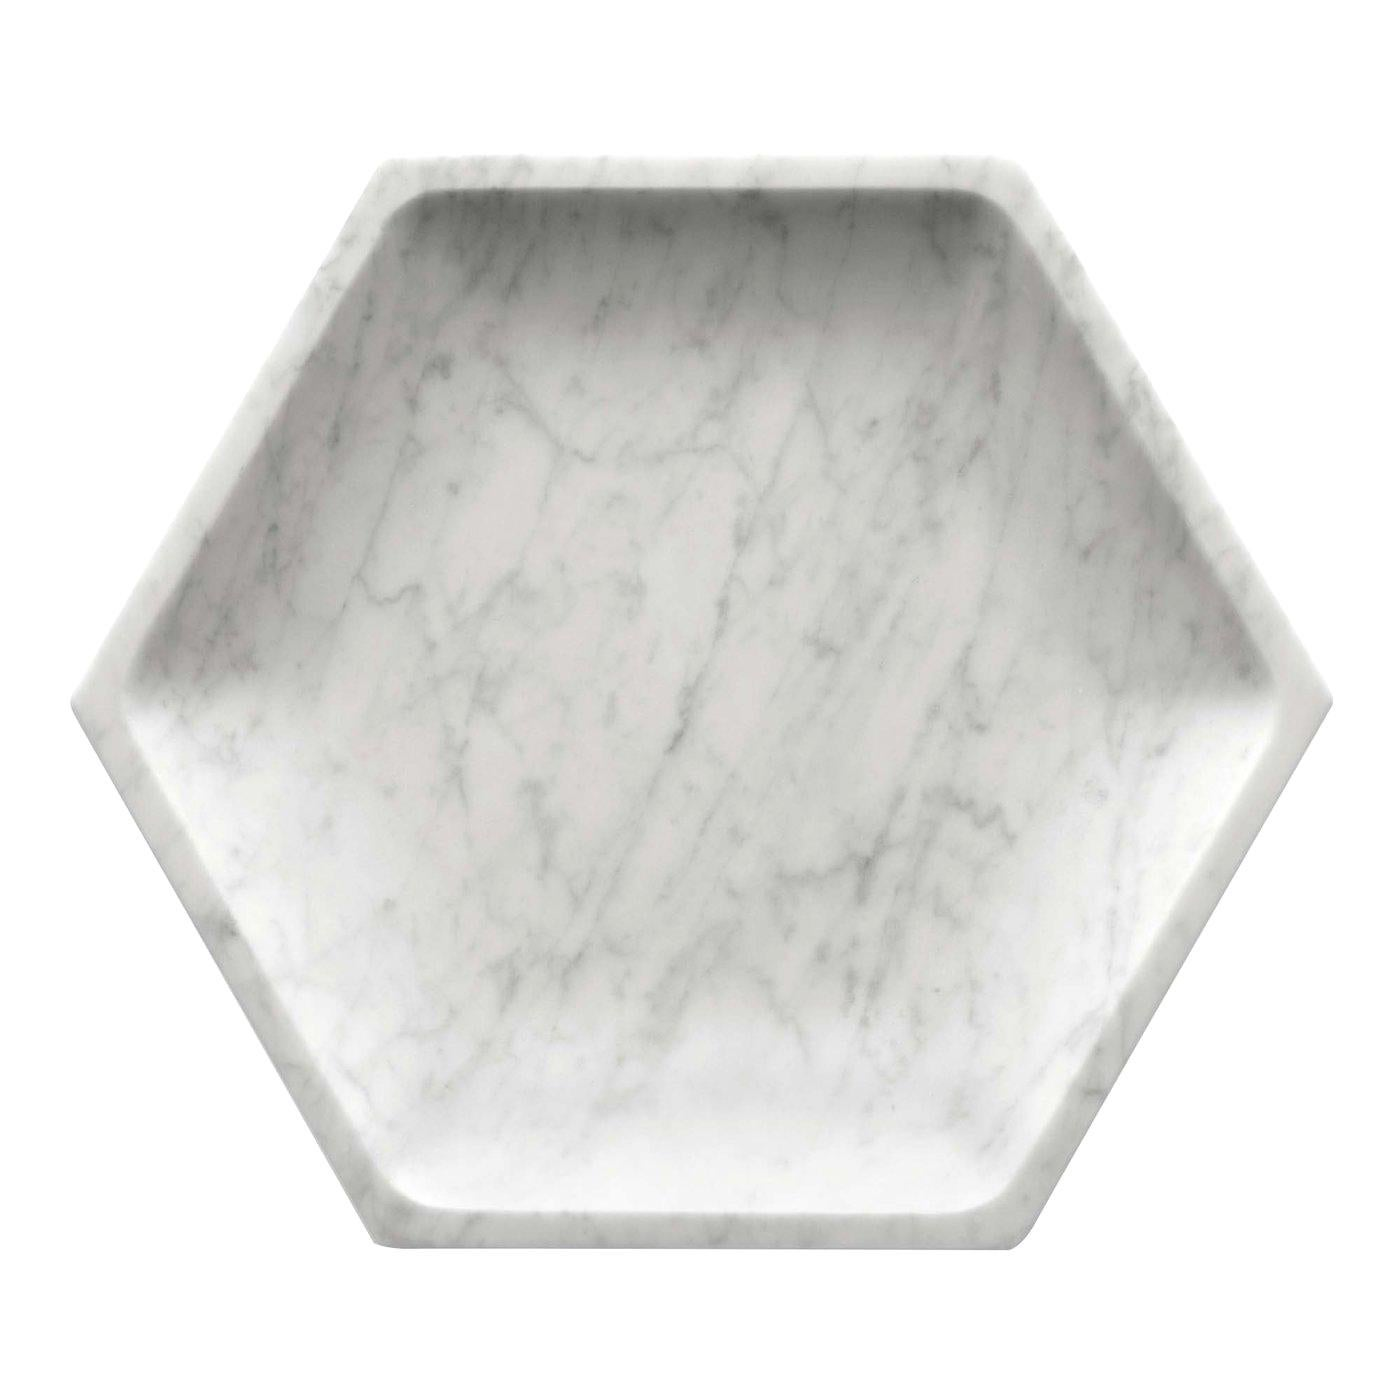 White Gina Fruit Bowl, Design James Irvine, 2011